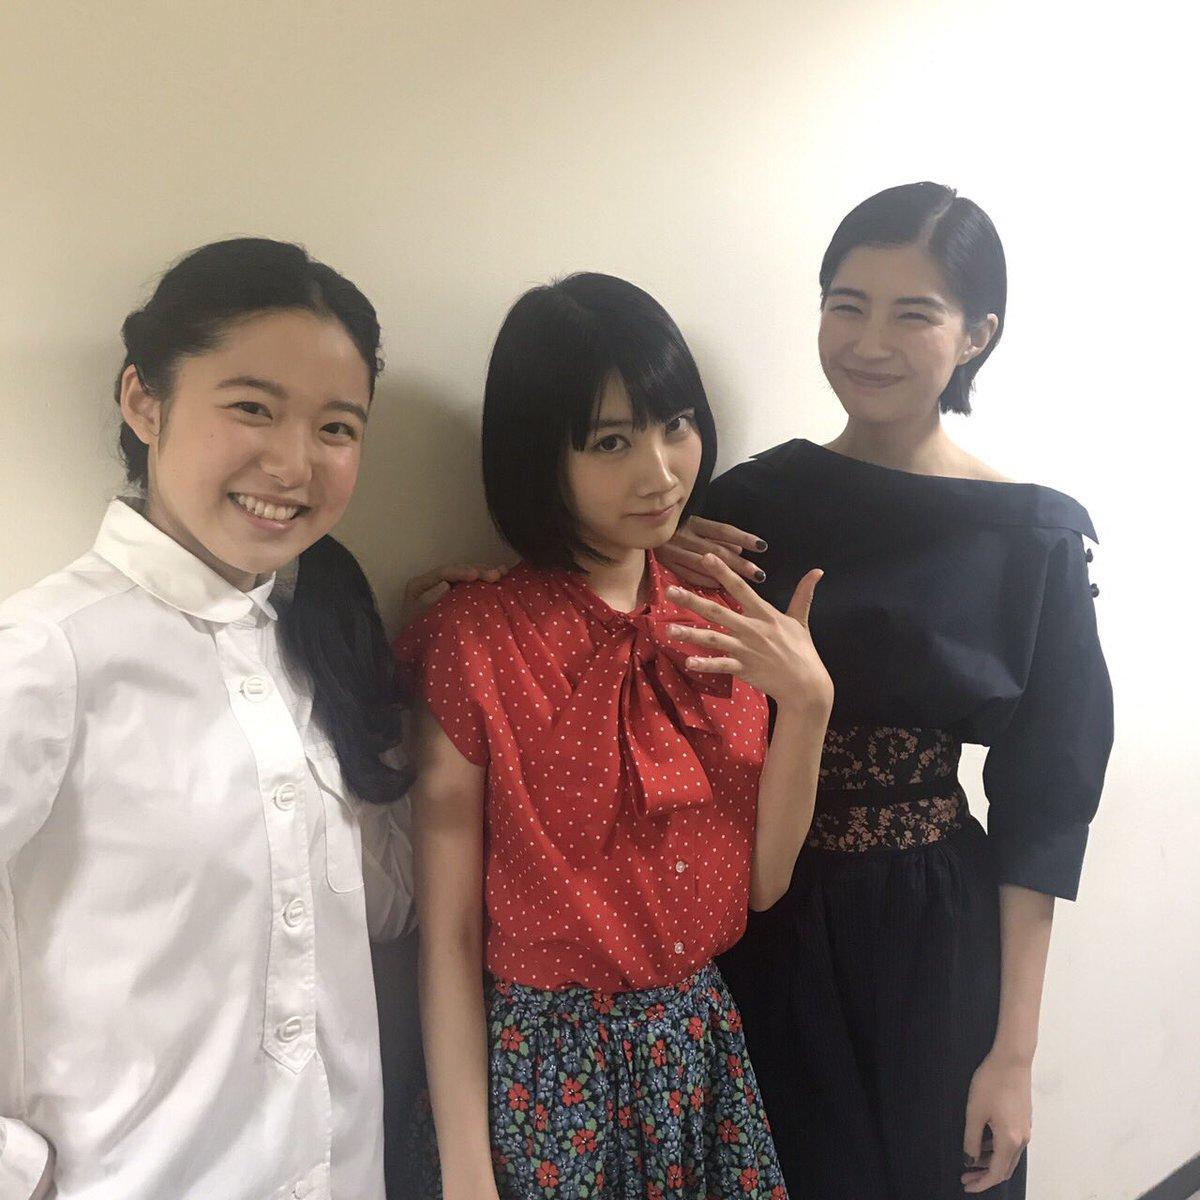 共演者と松本穂香